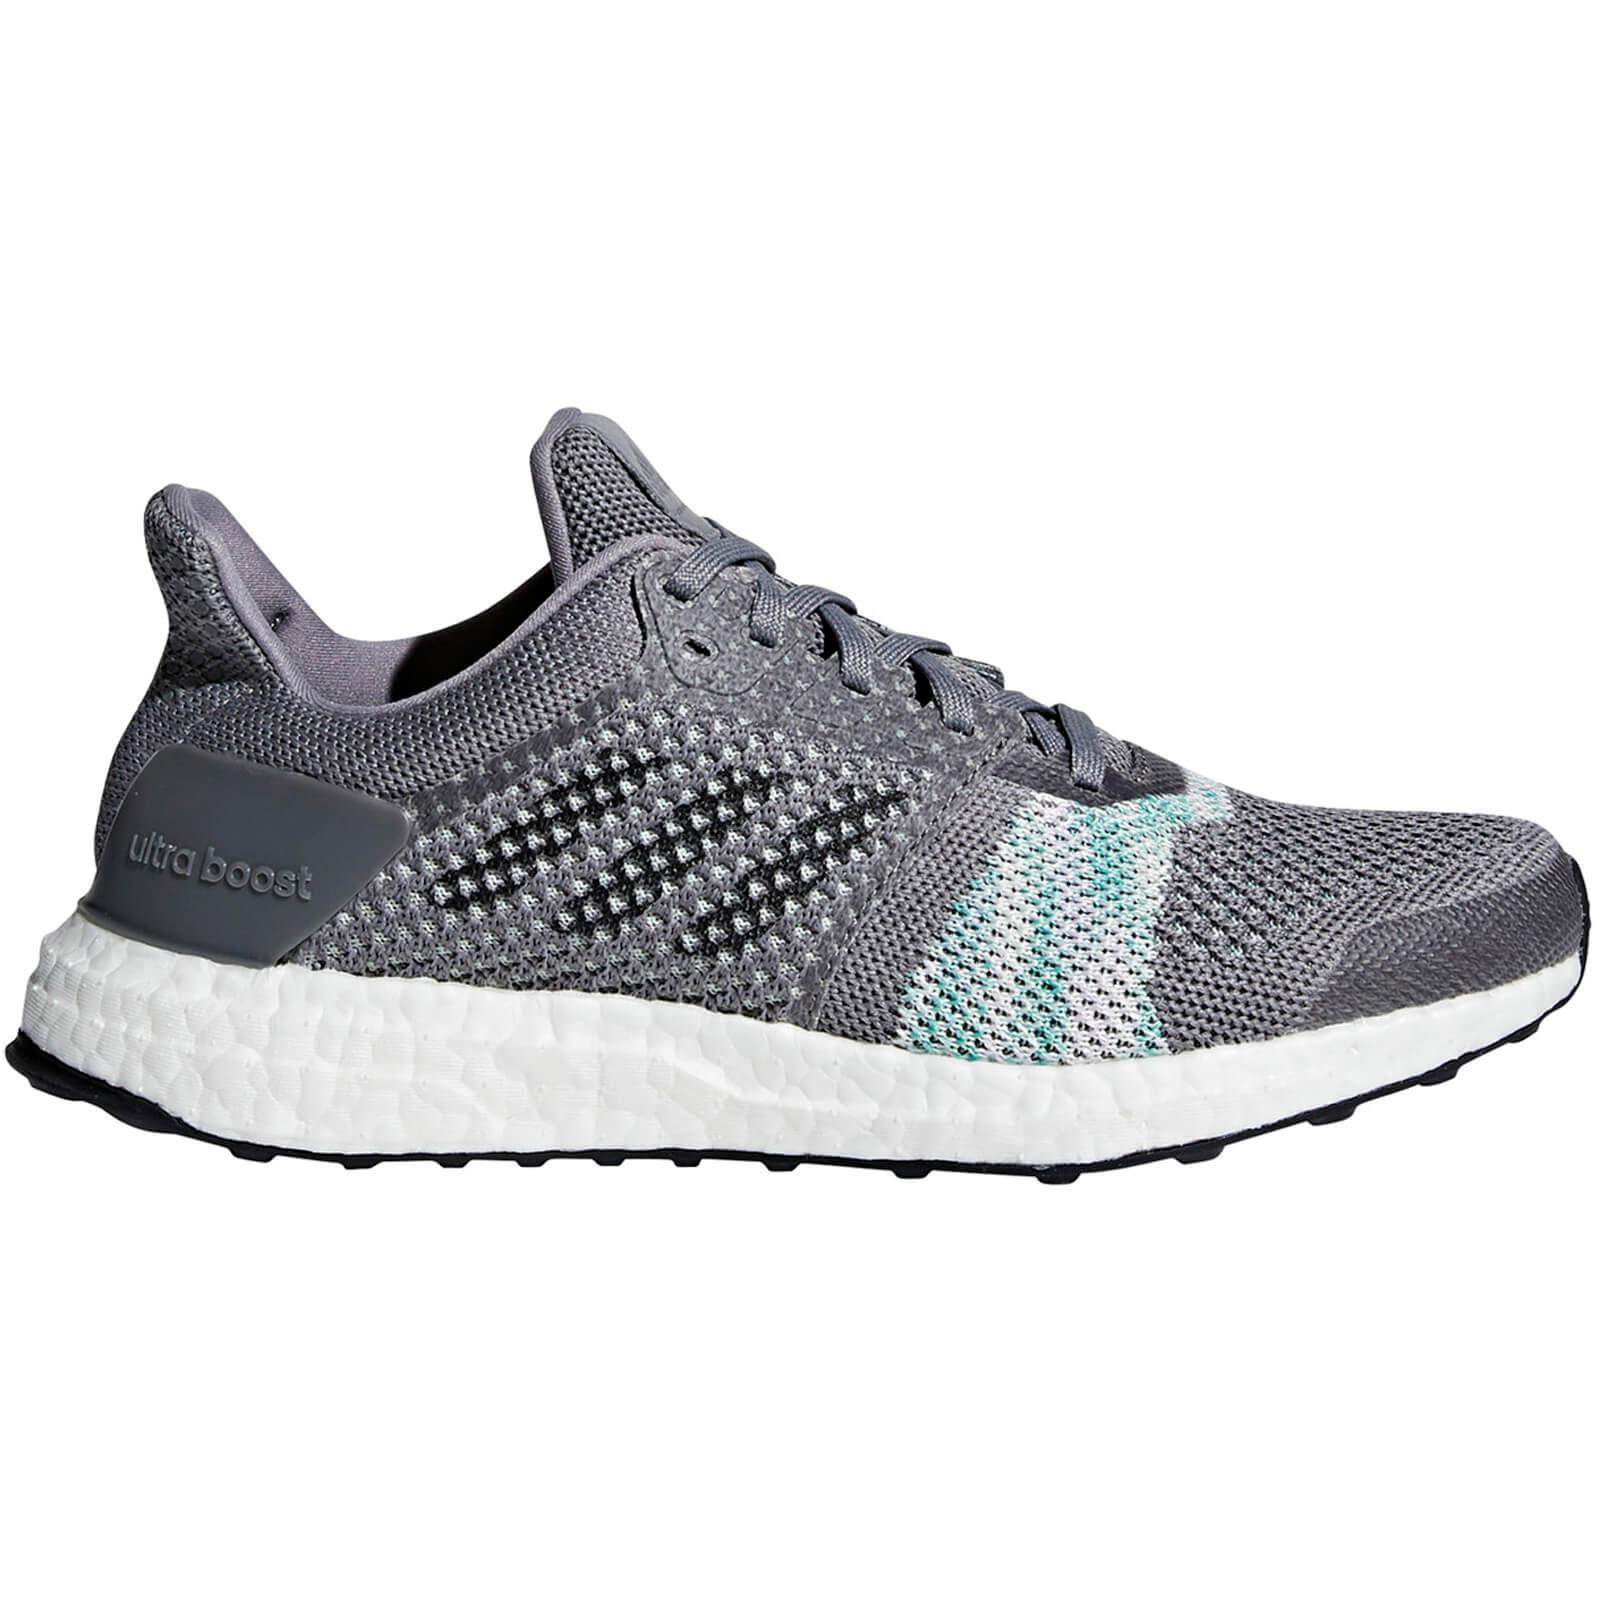 pretty nice 2925f 8a46e adidas. Womens Black Ultra Boost St Running Shoes